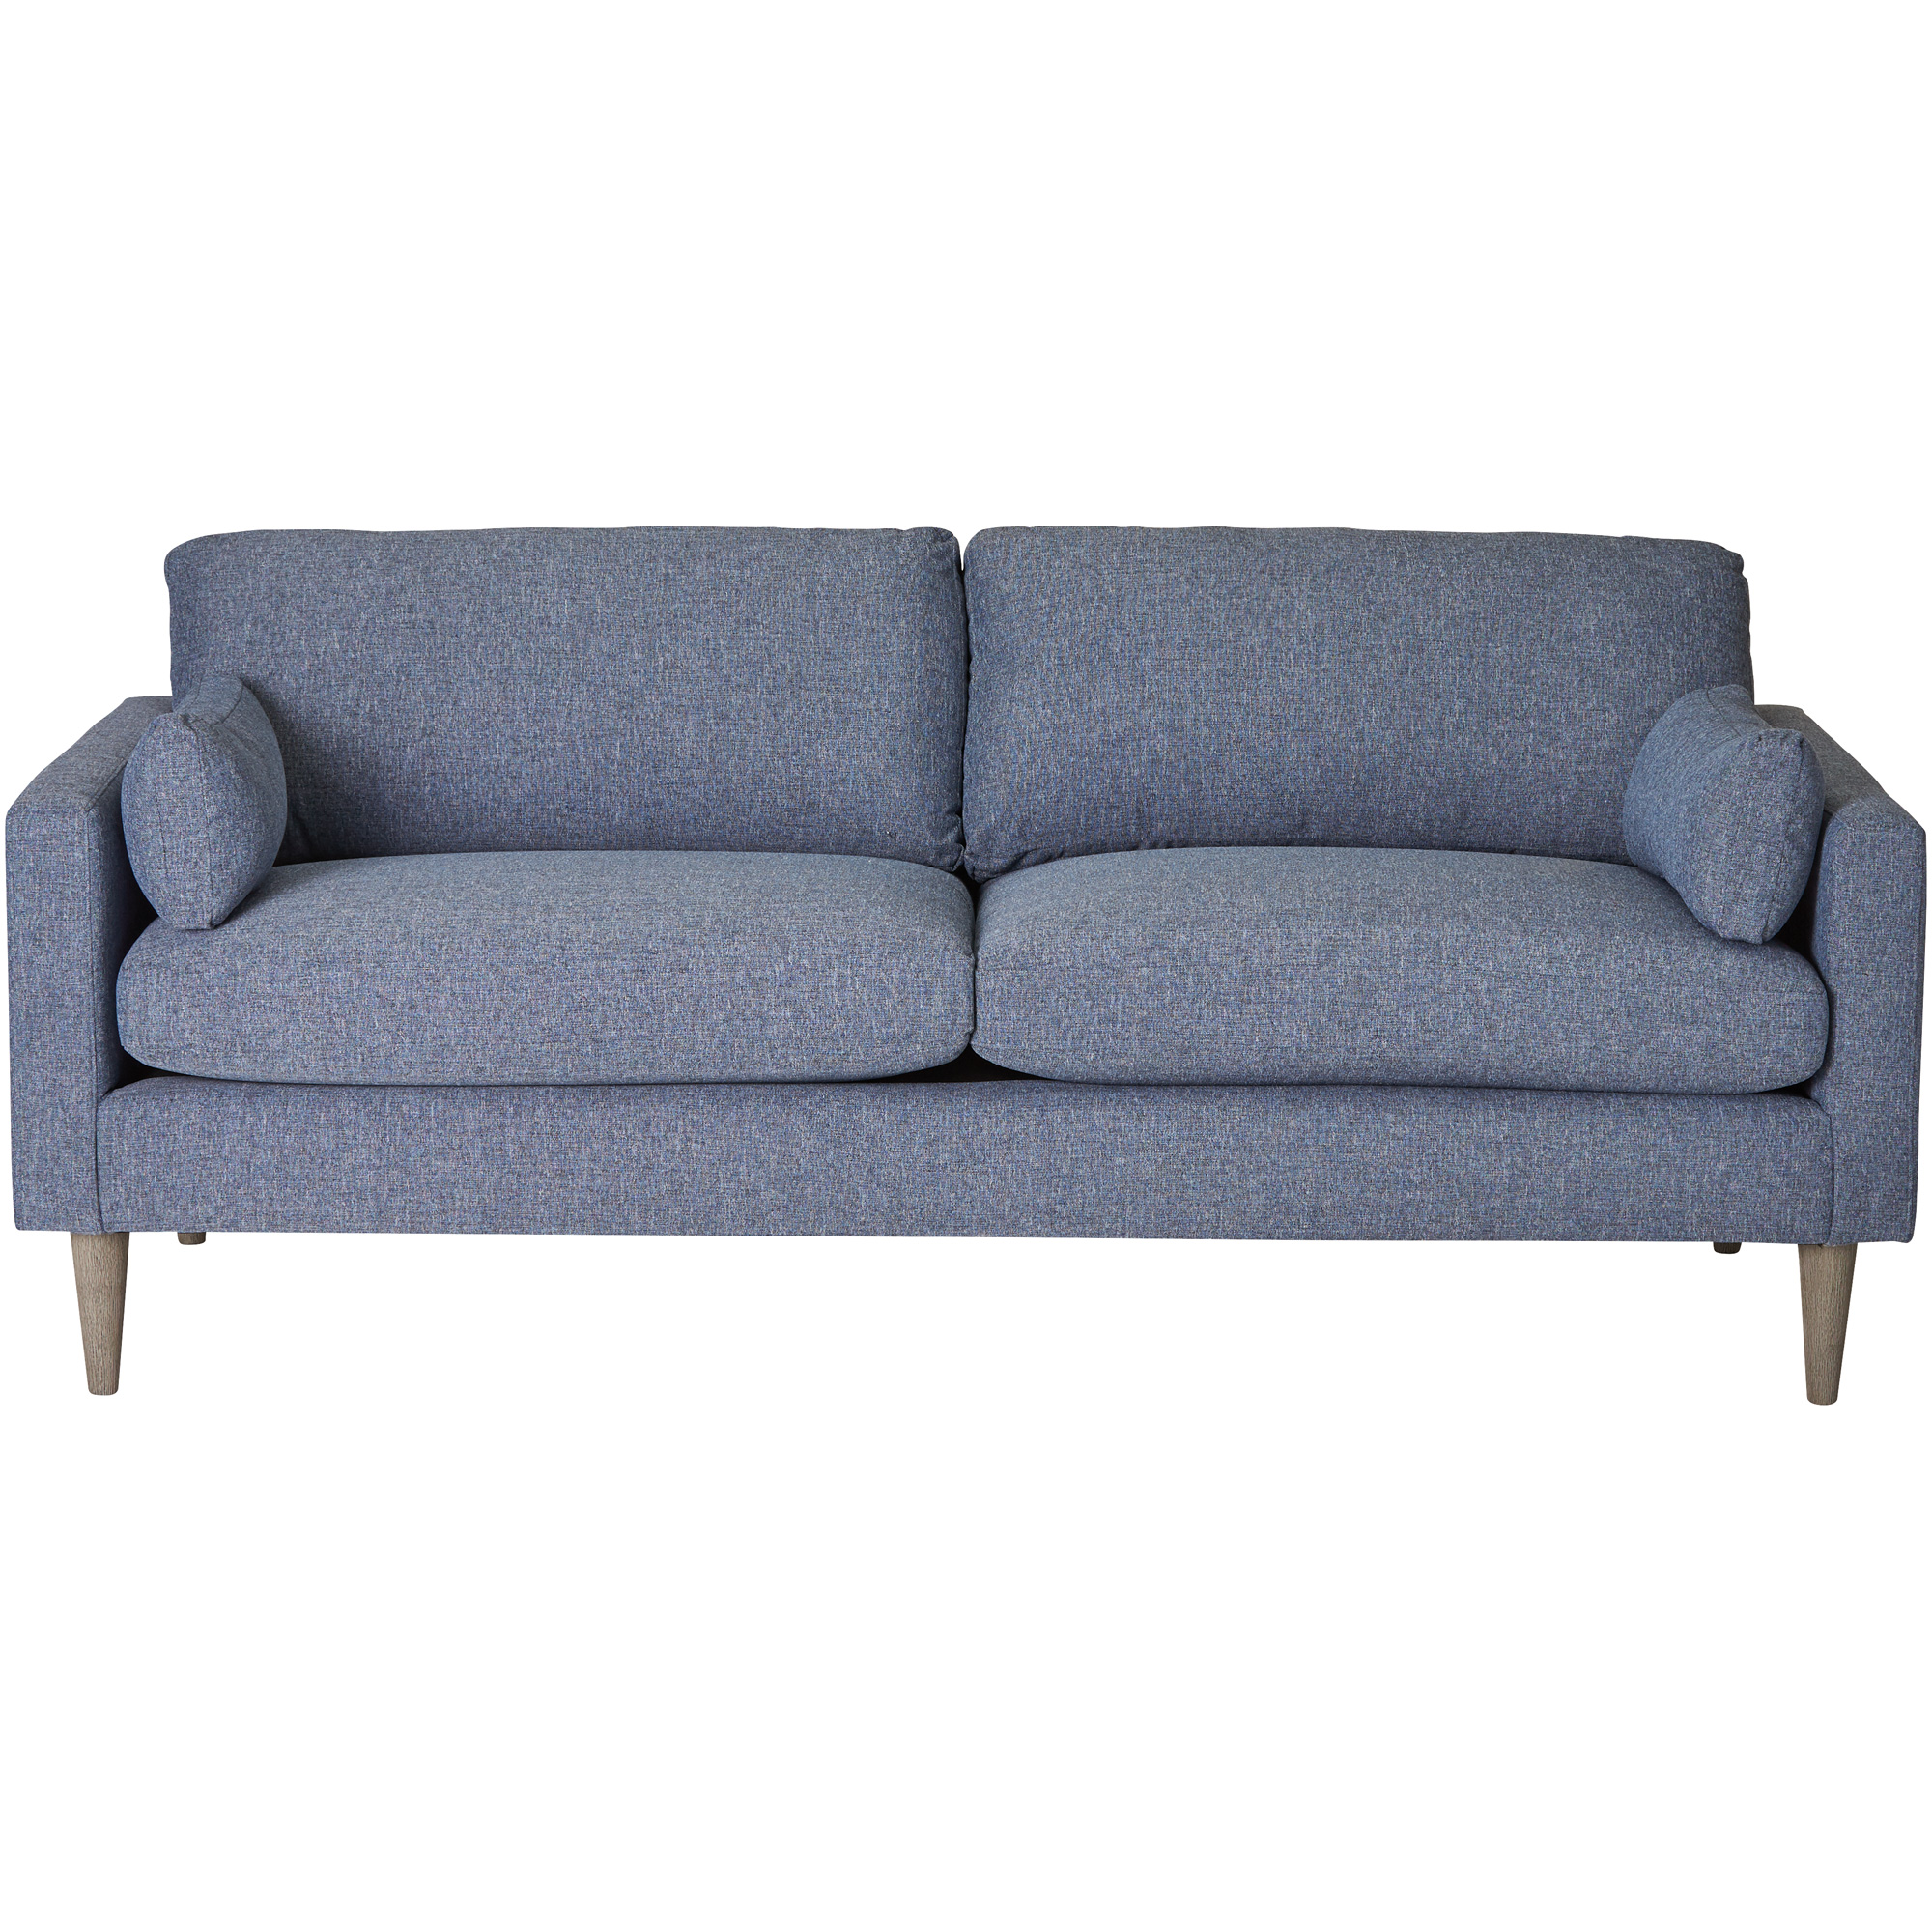 Best Home Furnishings | Trafton Denim Sofa